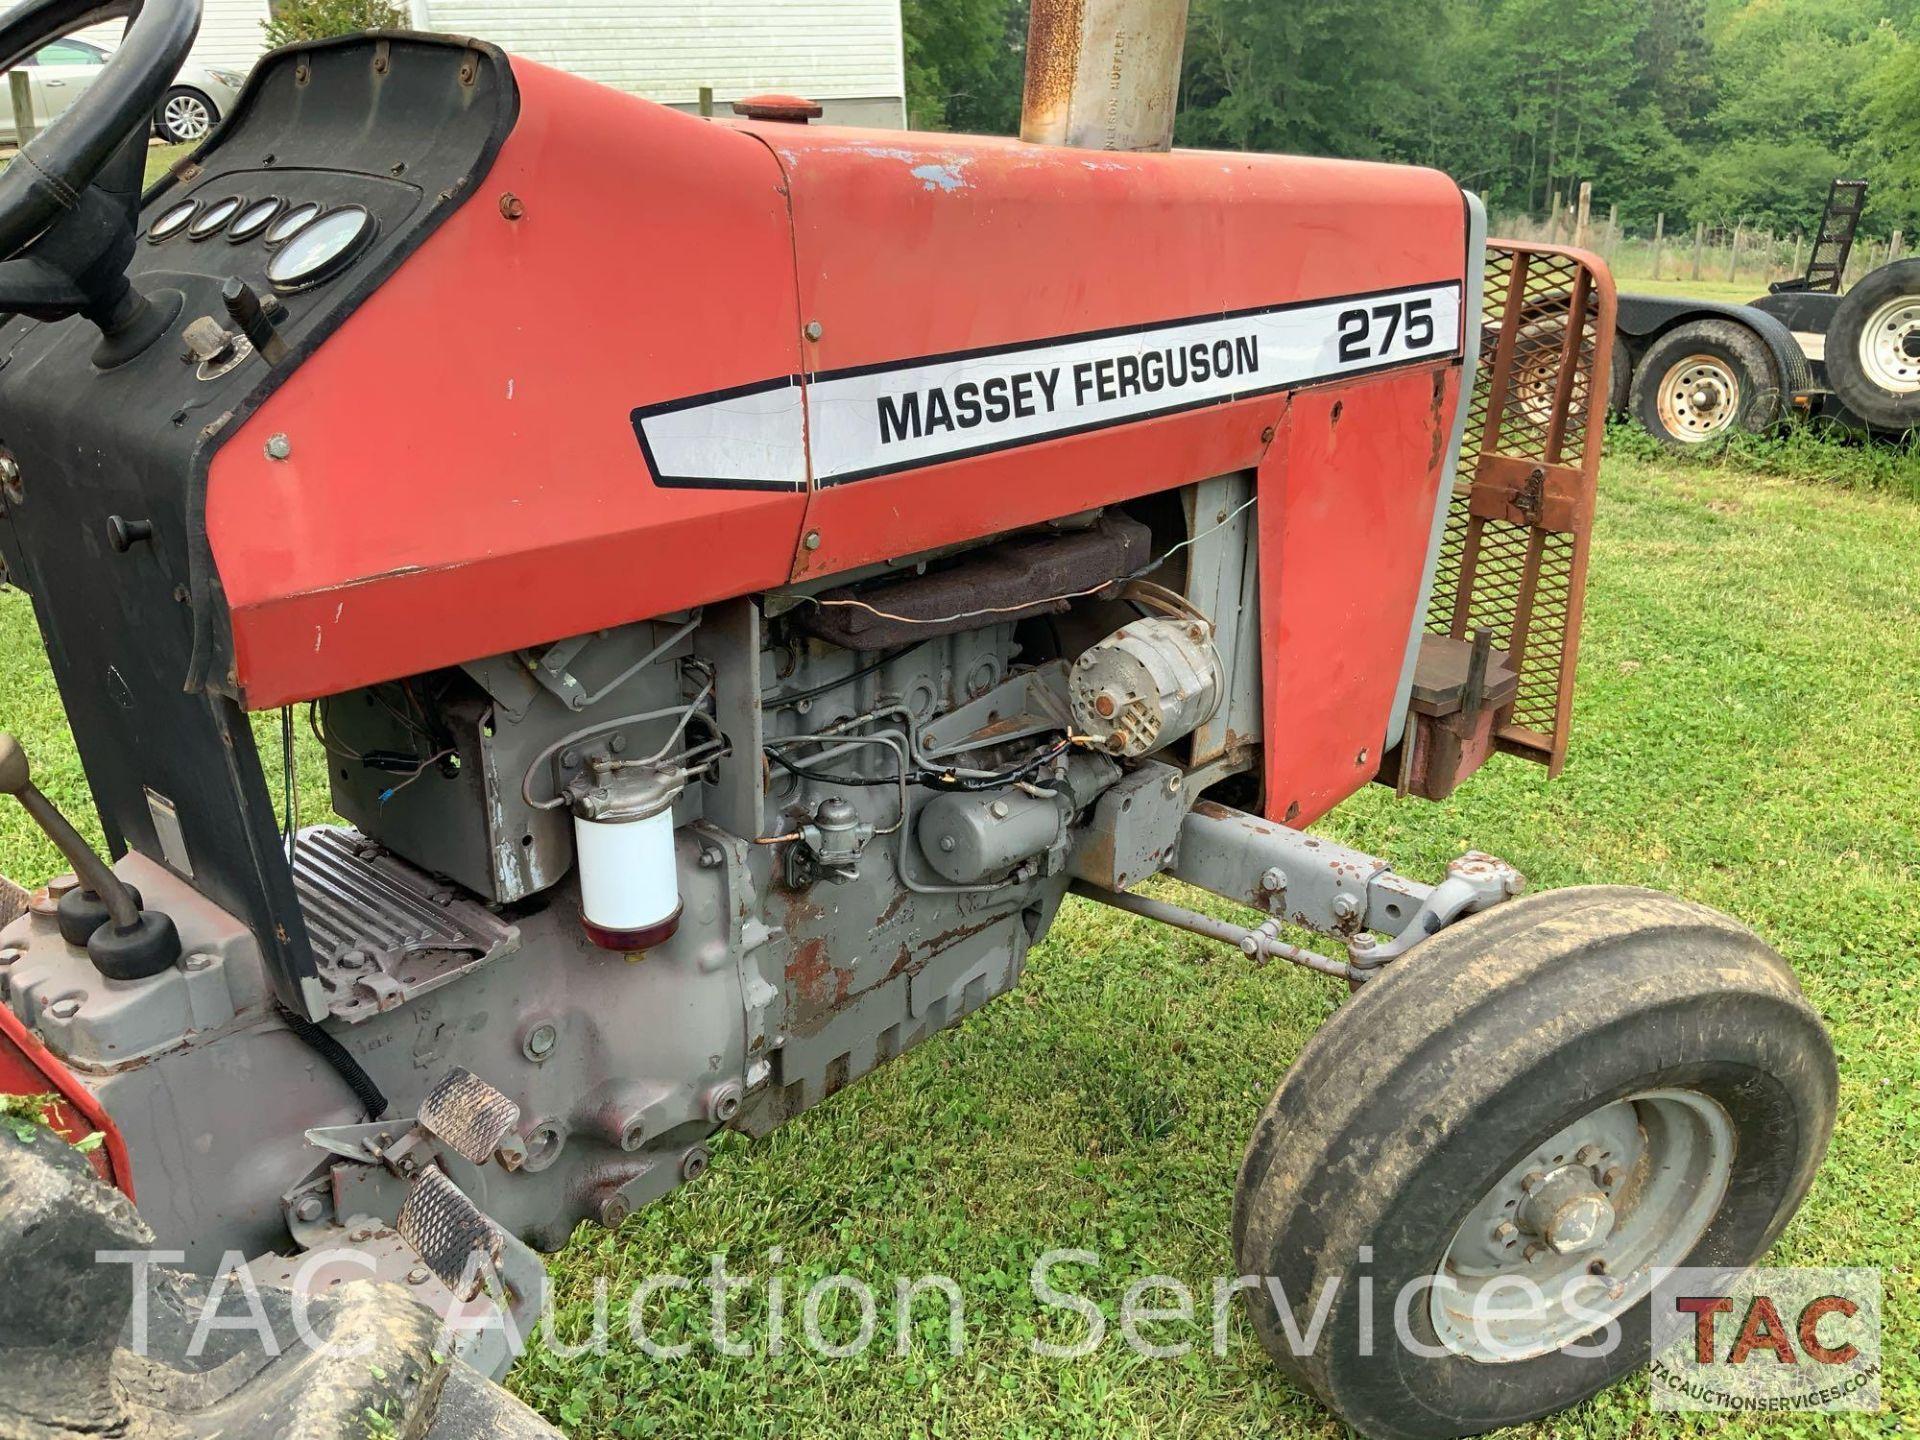 Massey Ferguson 275 Farm Tractor - Image 19 of 25